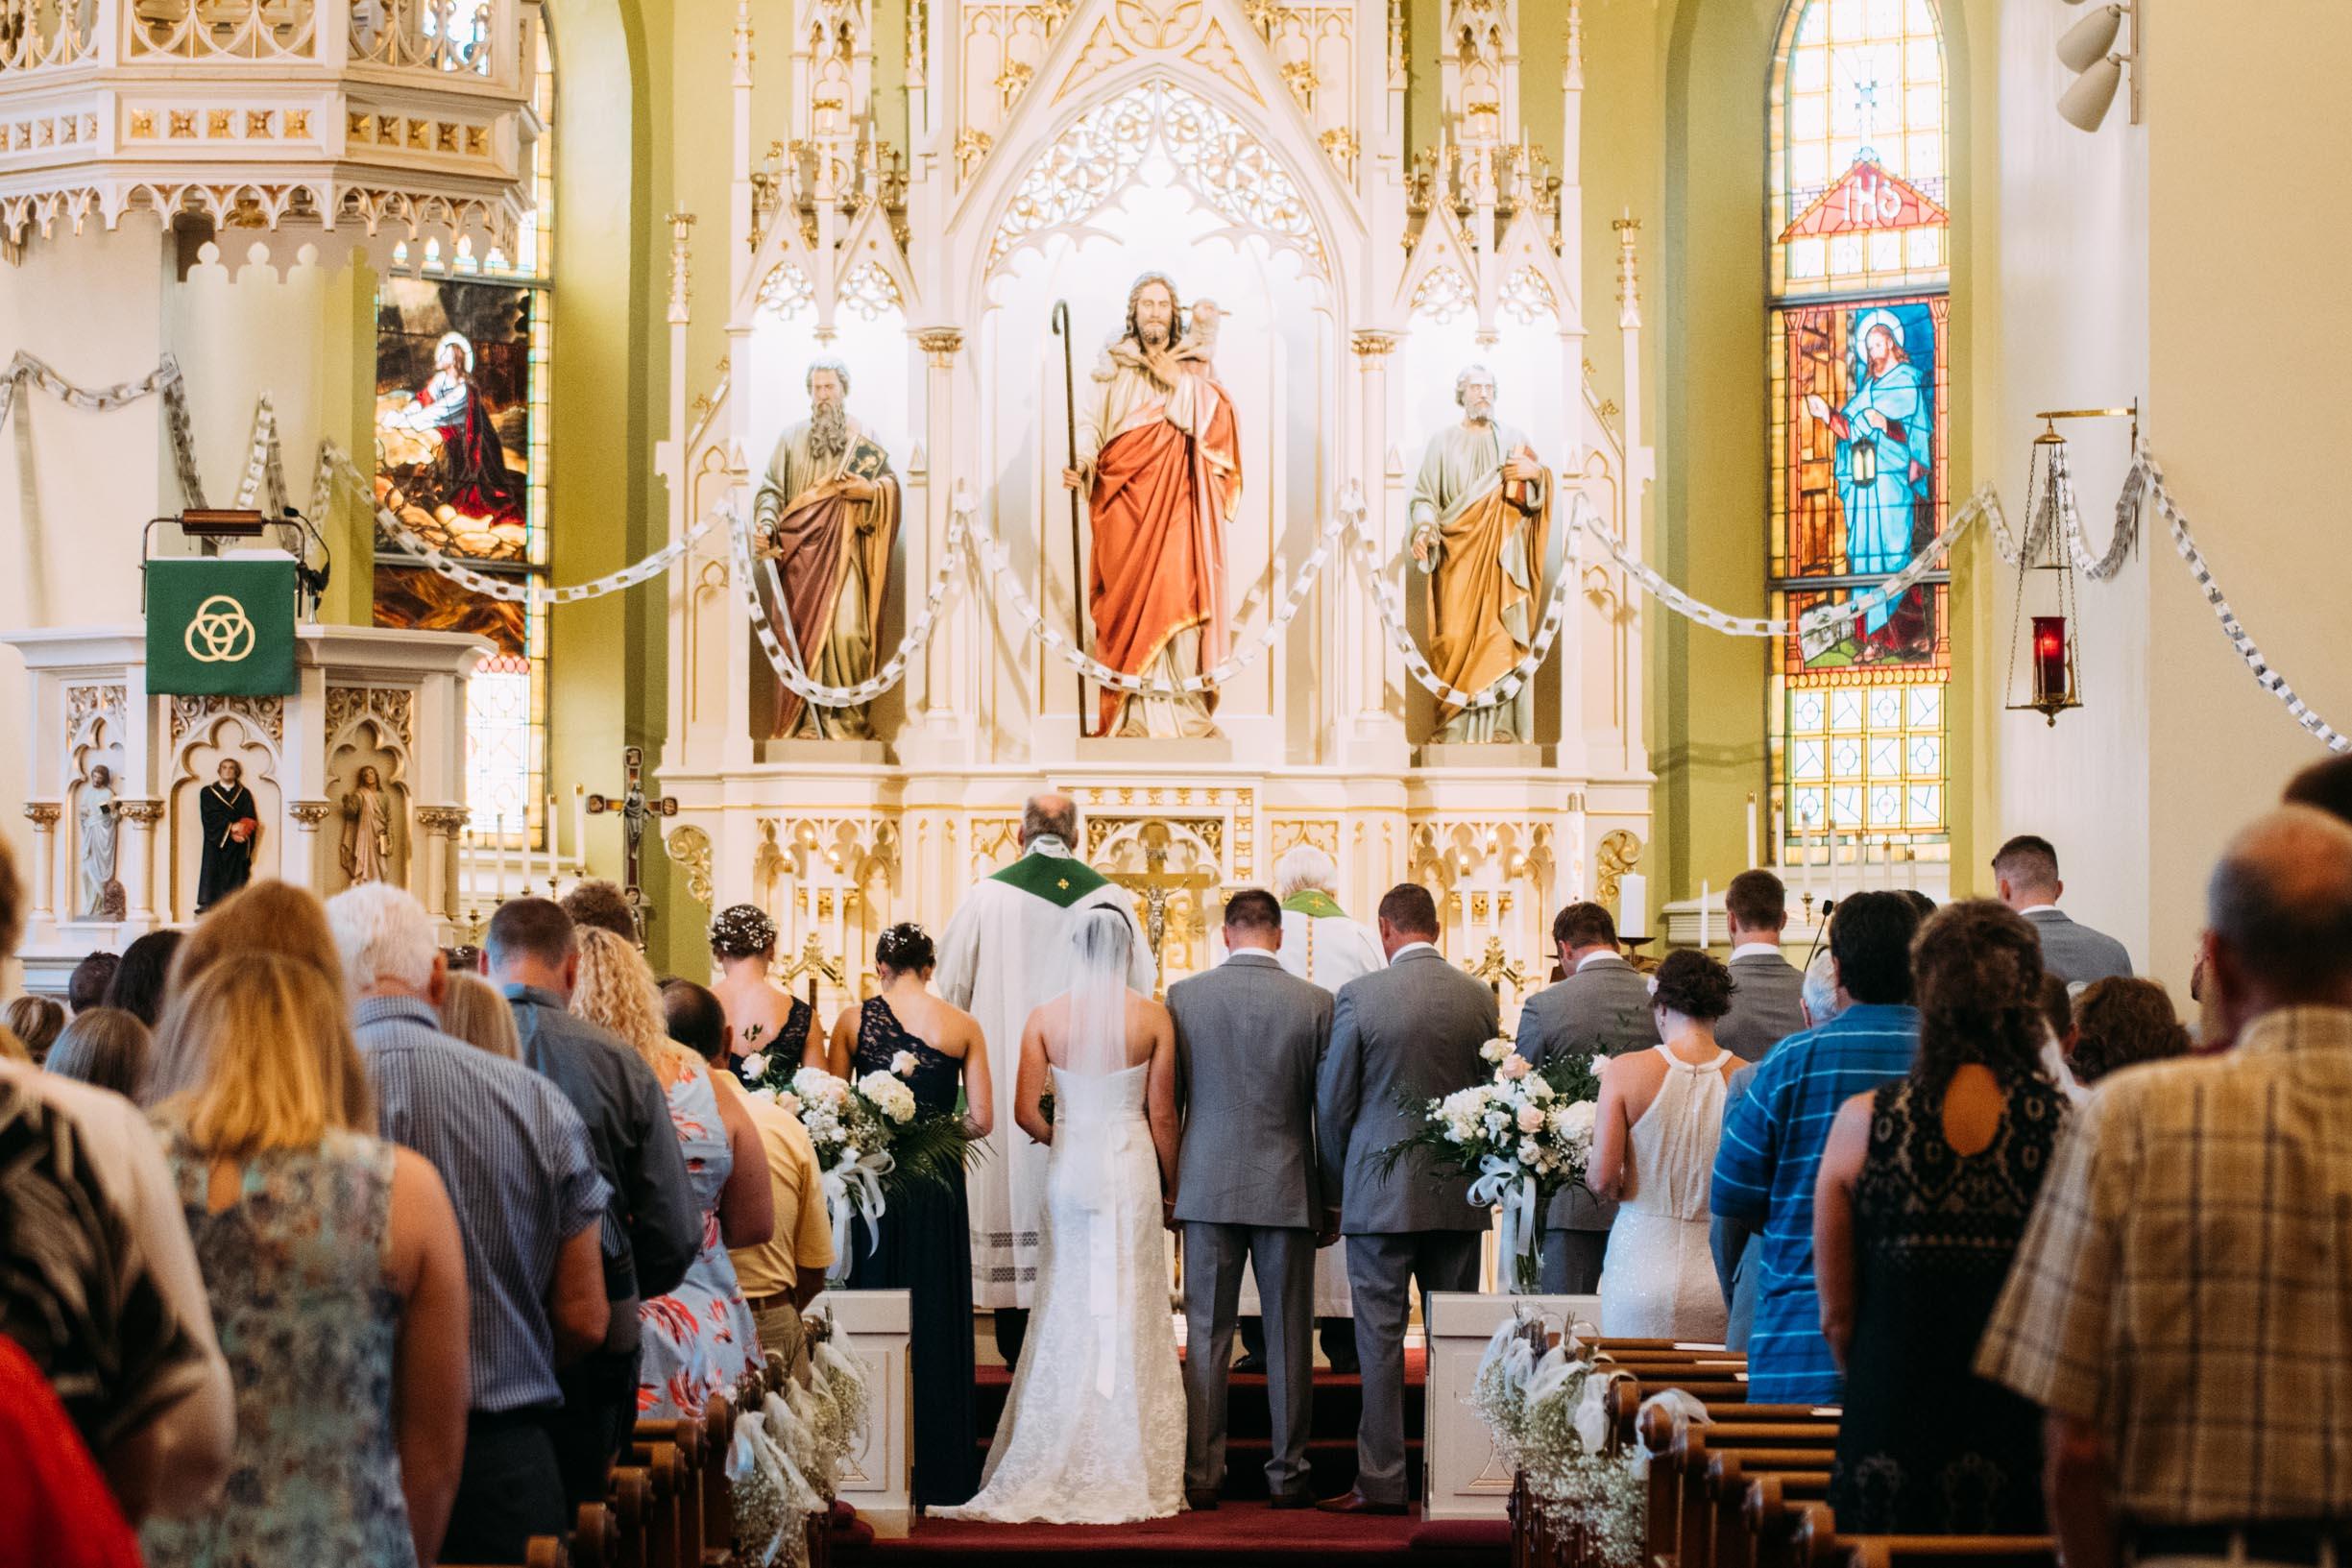 14-Lindsey Jake Wedding Winona St Martin's Lutheran Church.jpg